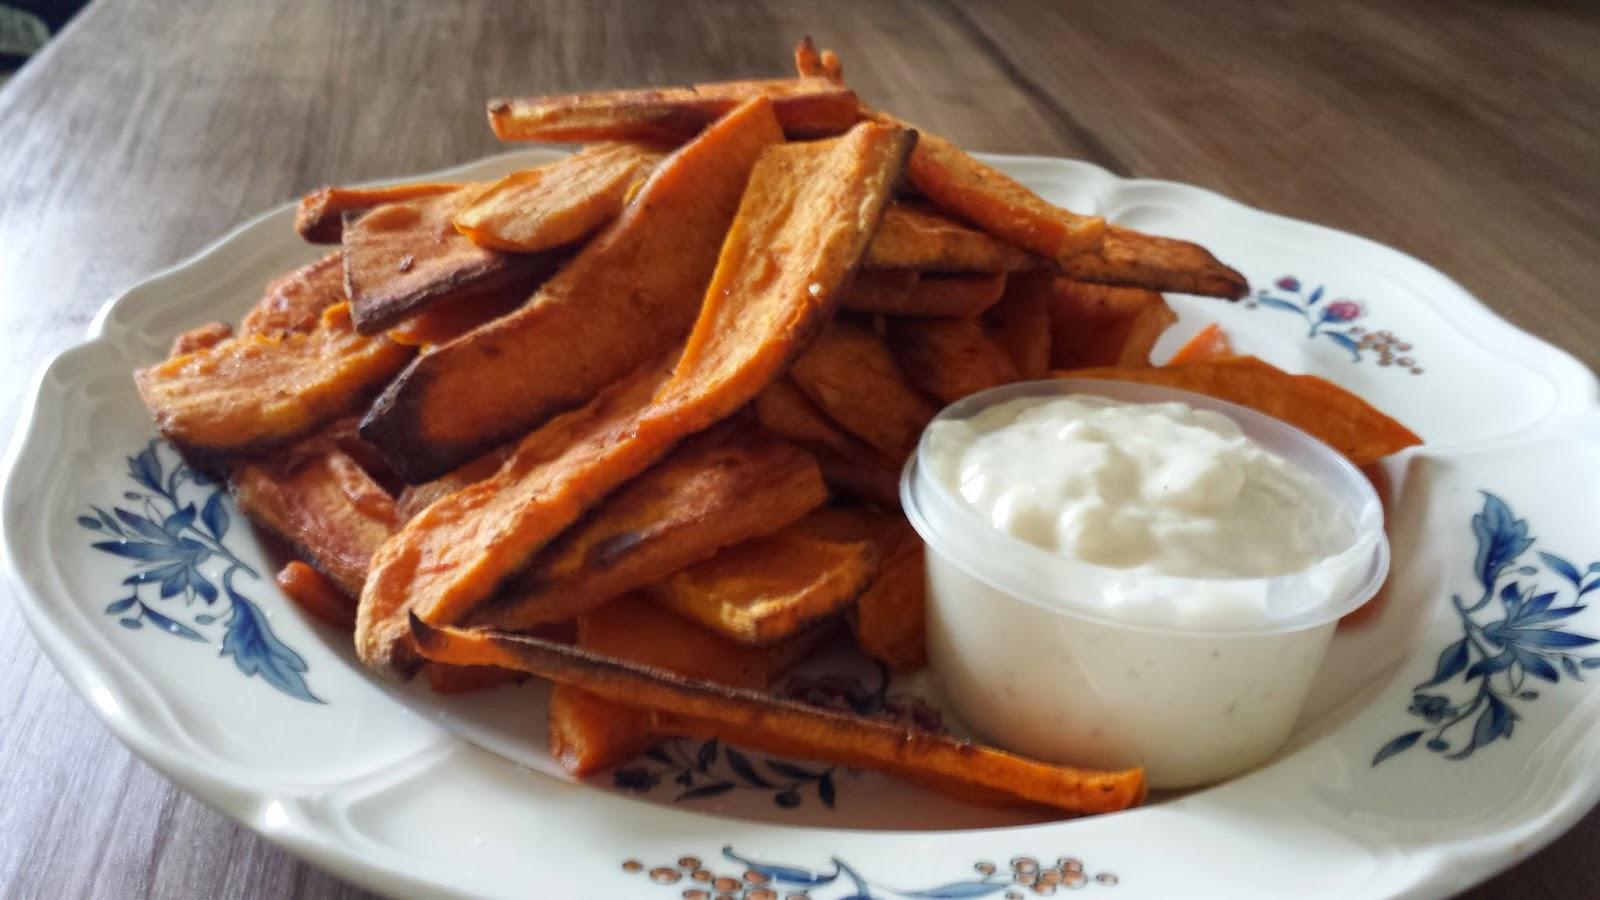 Half Baked Cooks: Sweet Potato Fries with Roasted Garlic Aioli